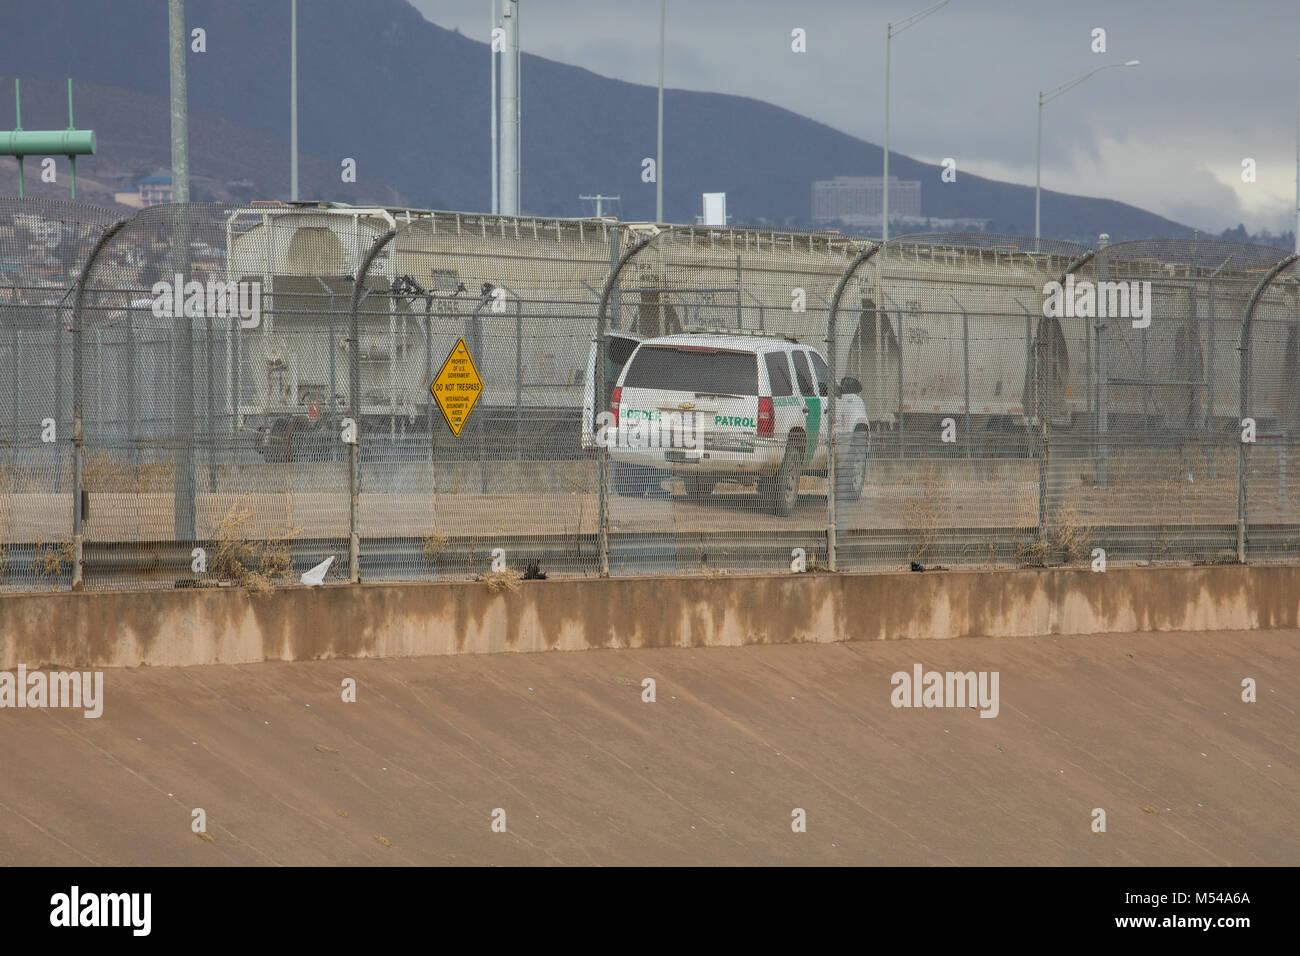 El Paso Border Fence Stock Photo